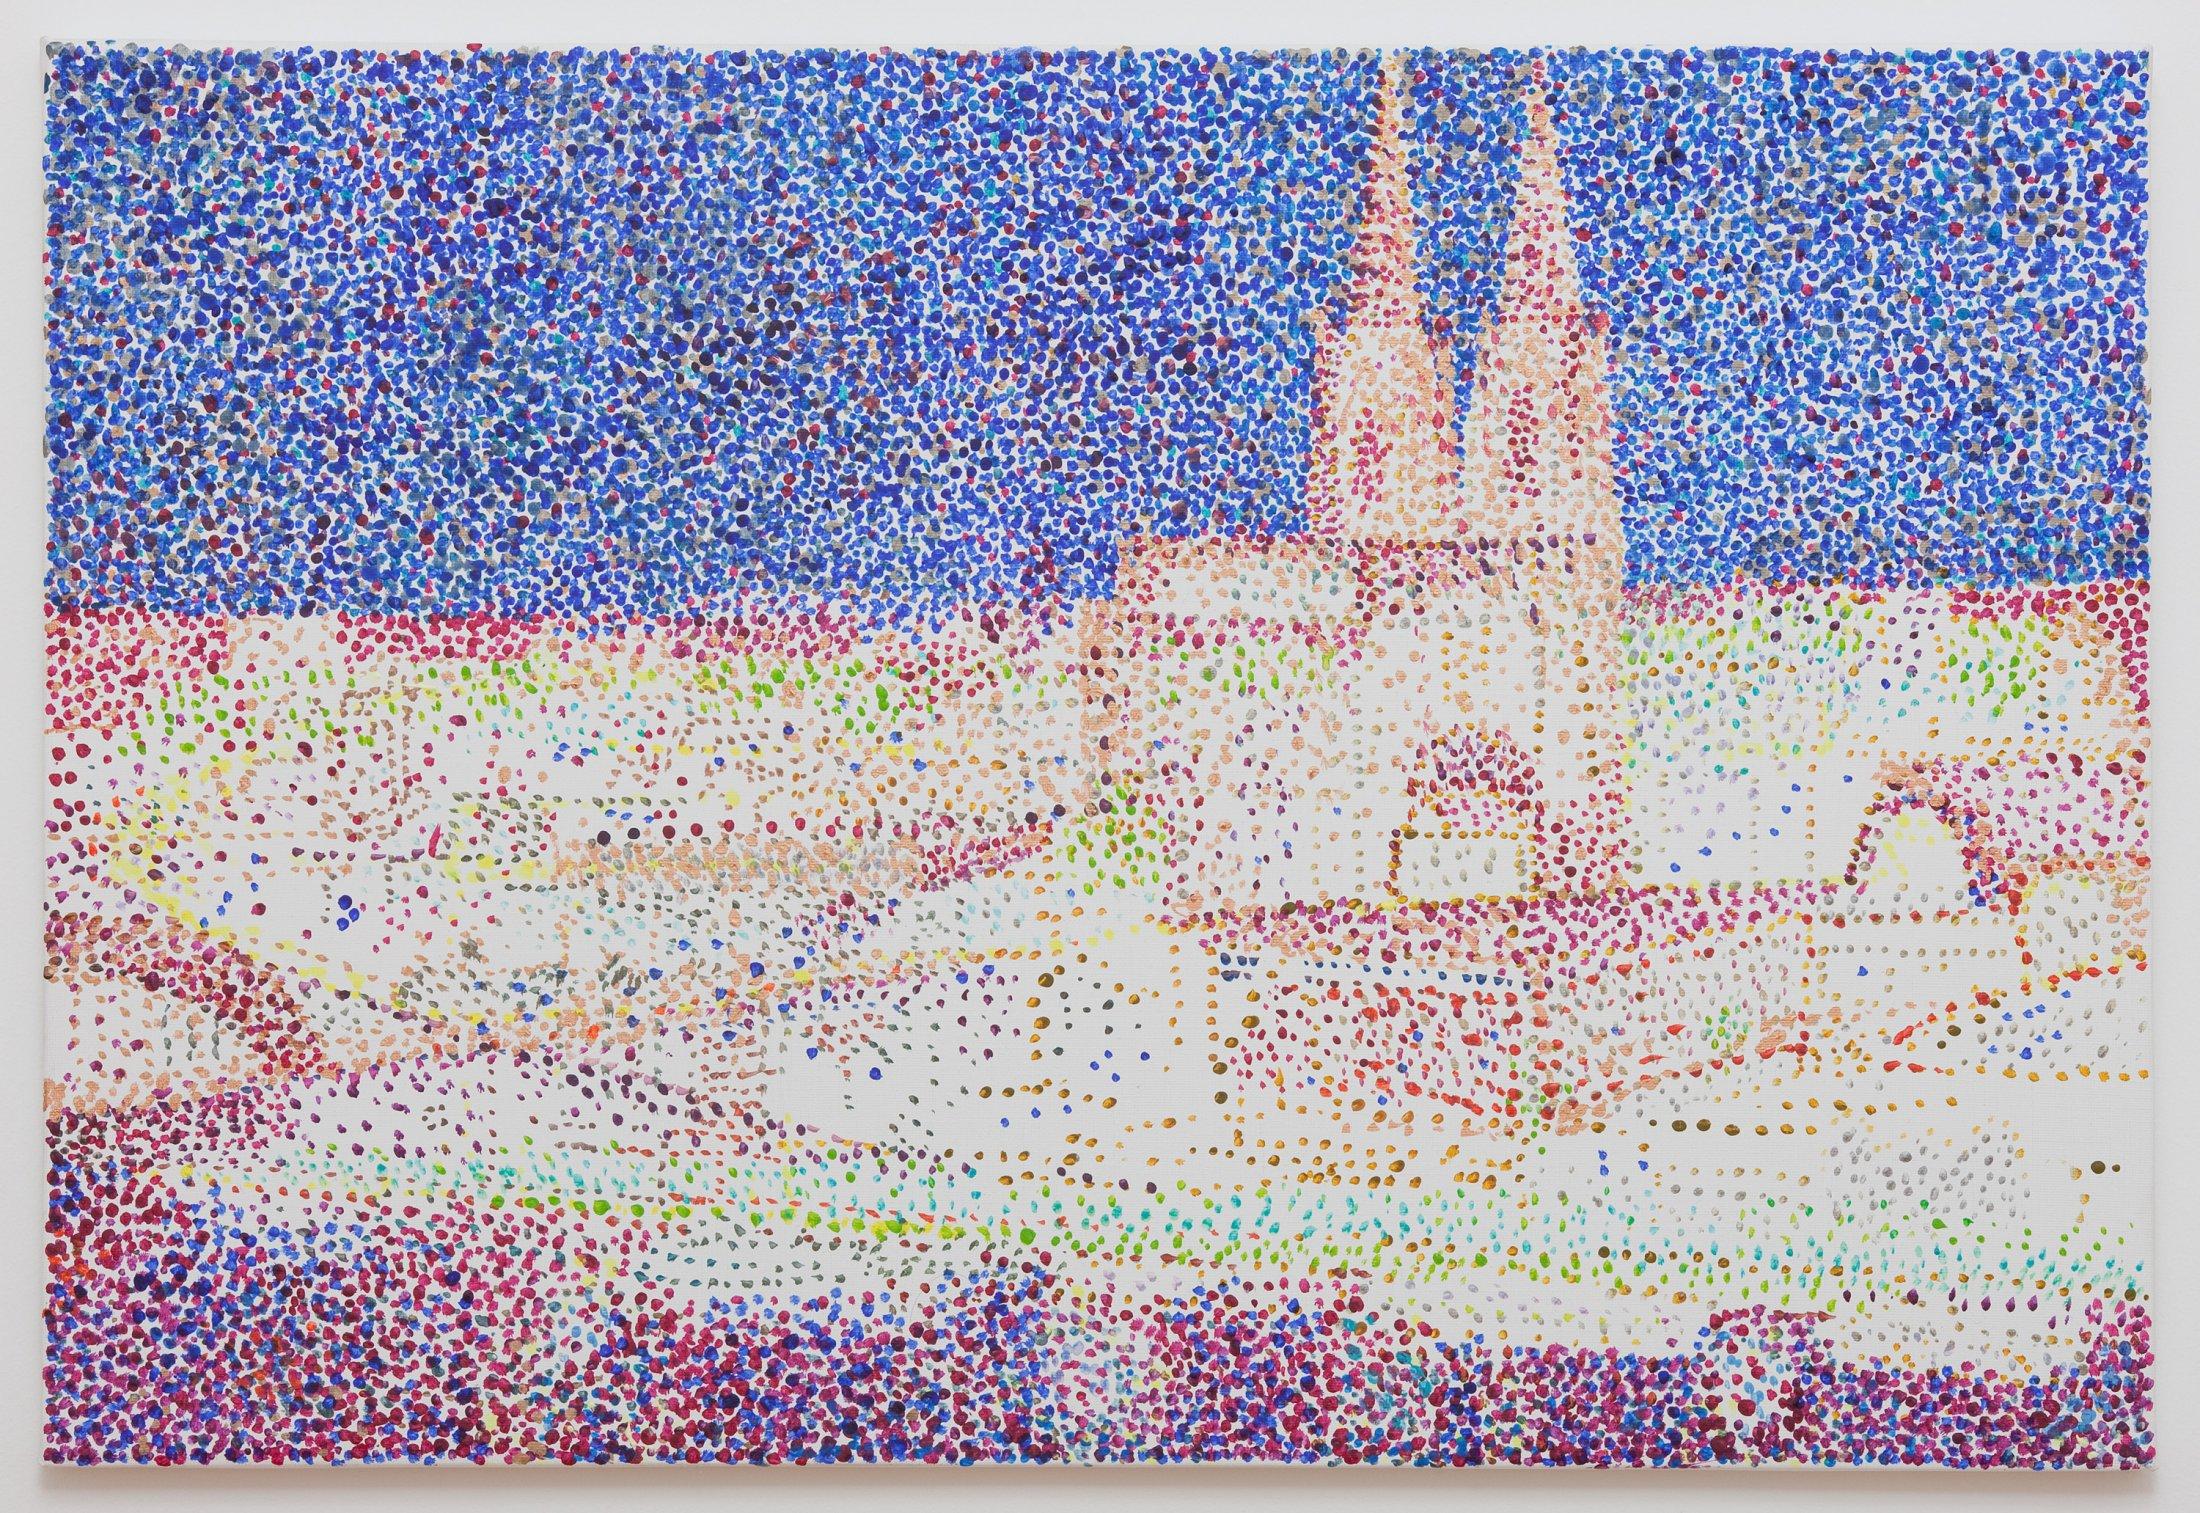 Post Card (Köln am Rhein) (II)